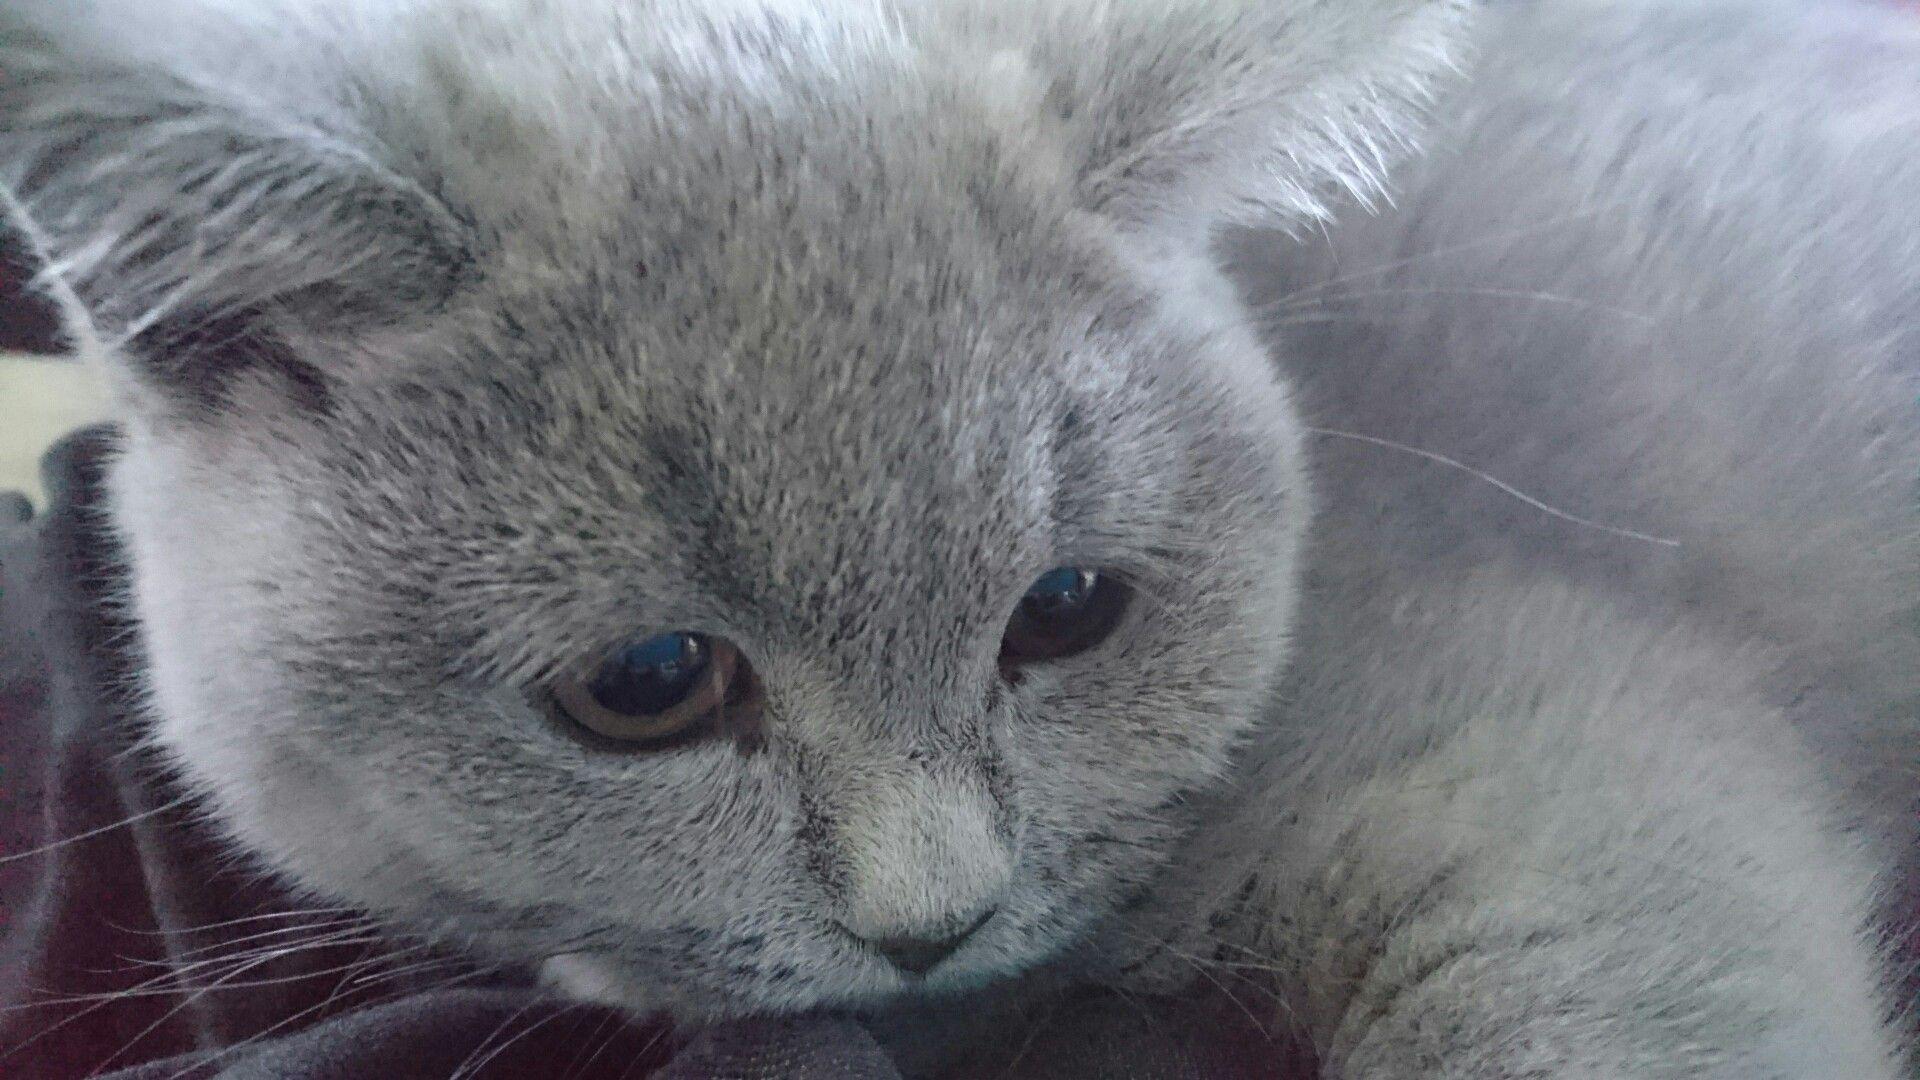 Boris the cat - British Short Hair kitten